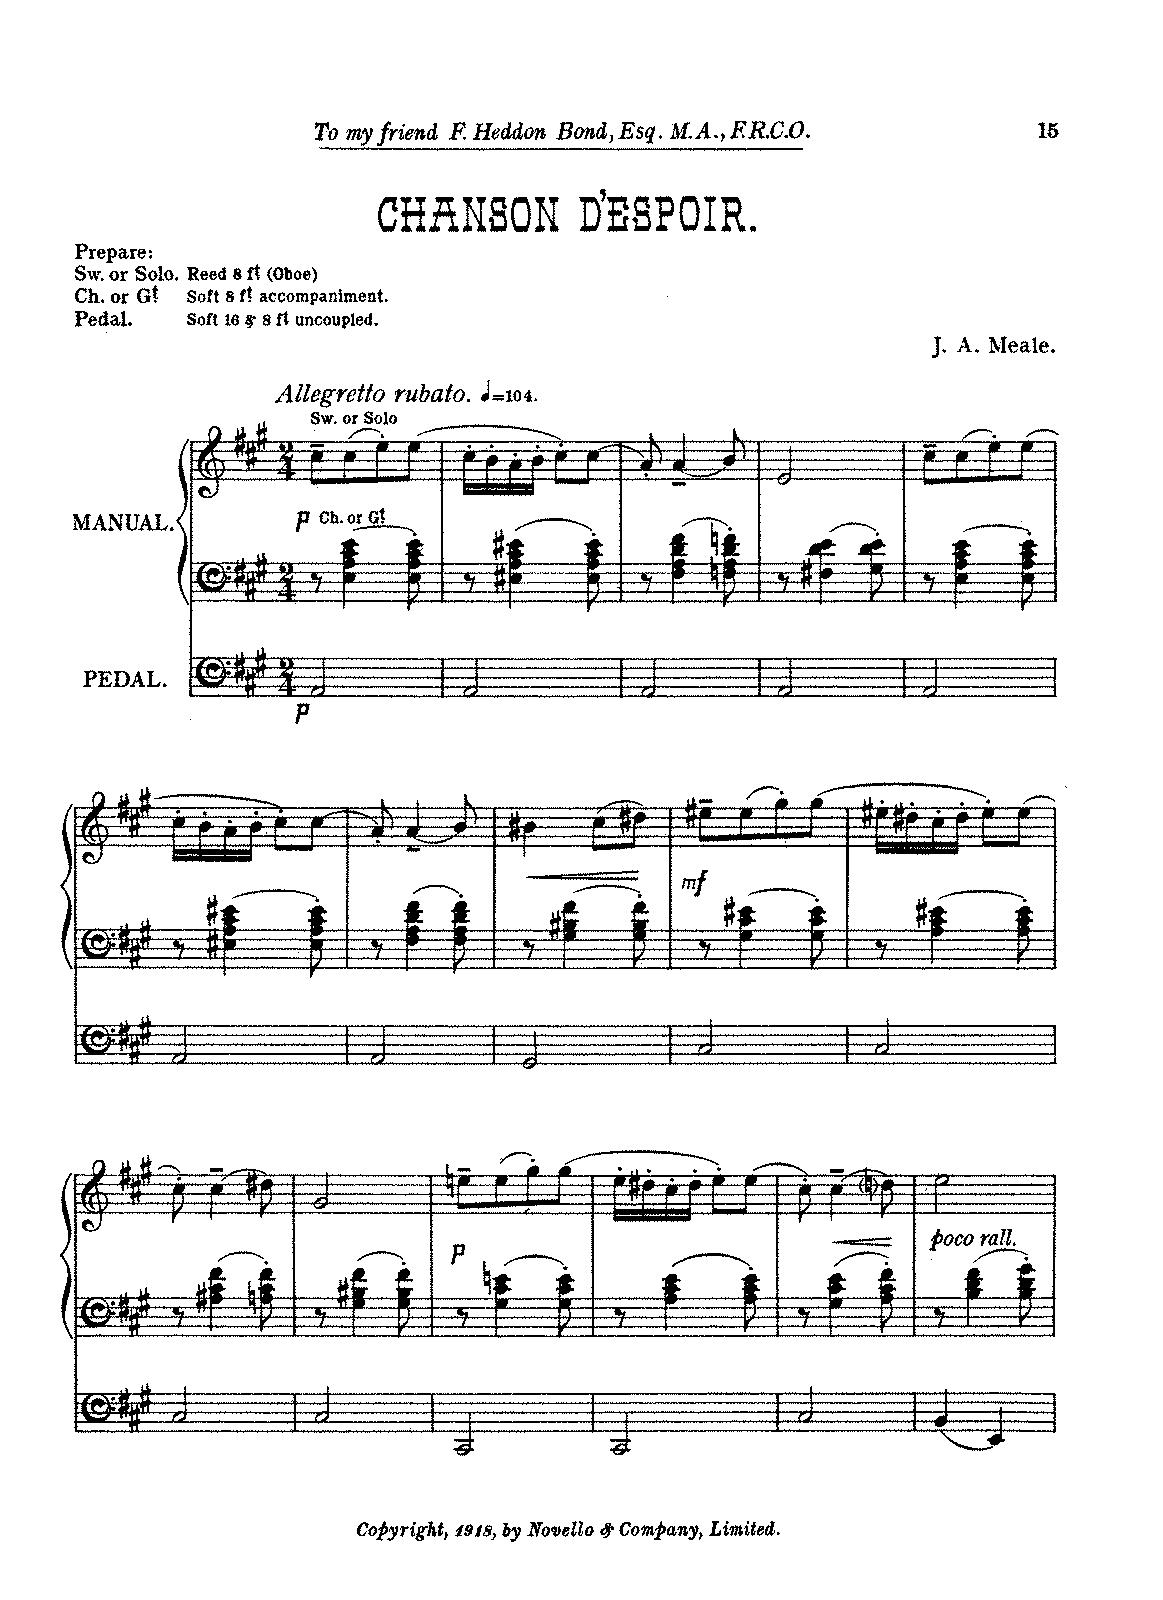 Chanson d'espoir (Meale, John Arthur) - IMSLP/Petrucci Music Library